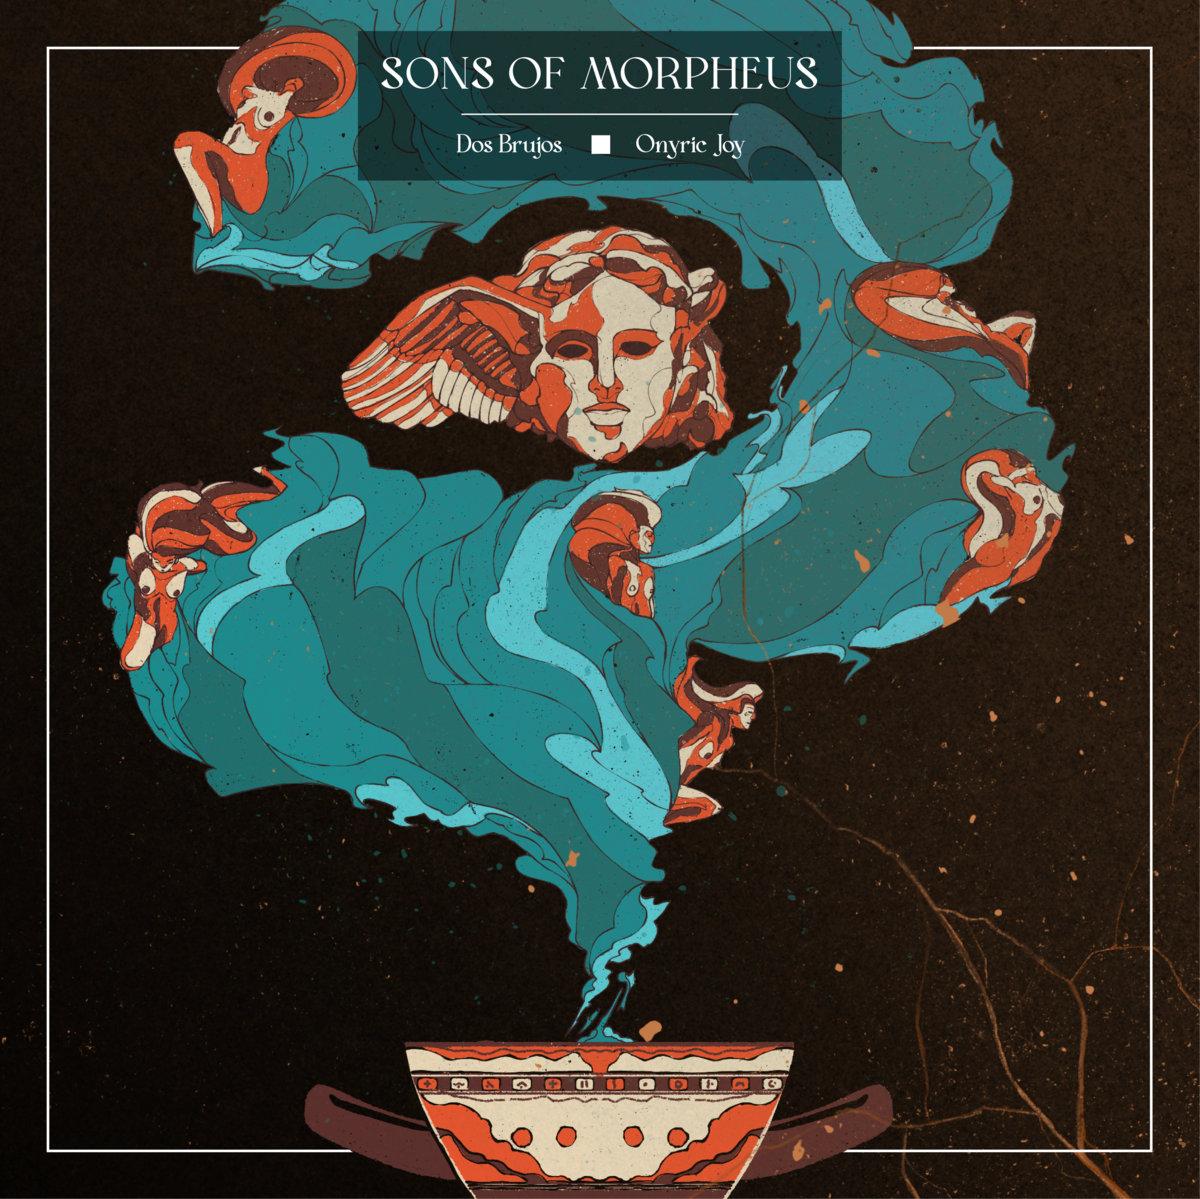 Reseña: ONYRIC JOY/DOS BRUJOS 'Sons ofMorpheus'